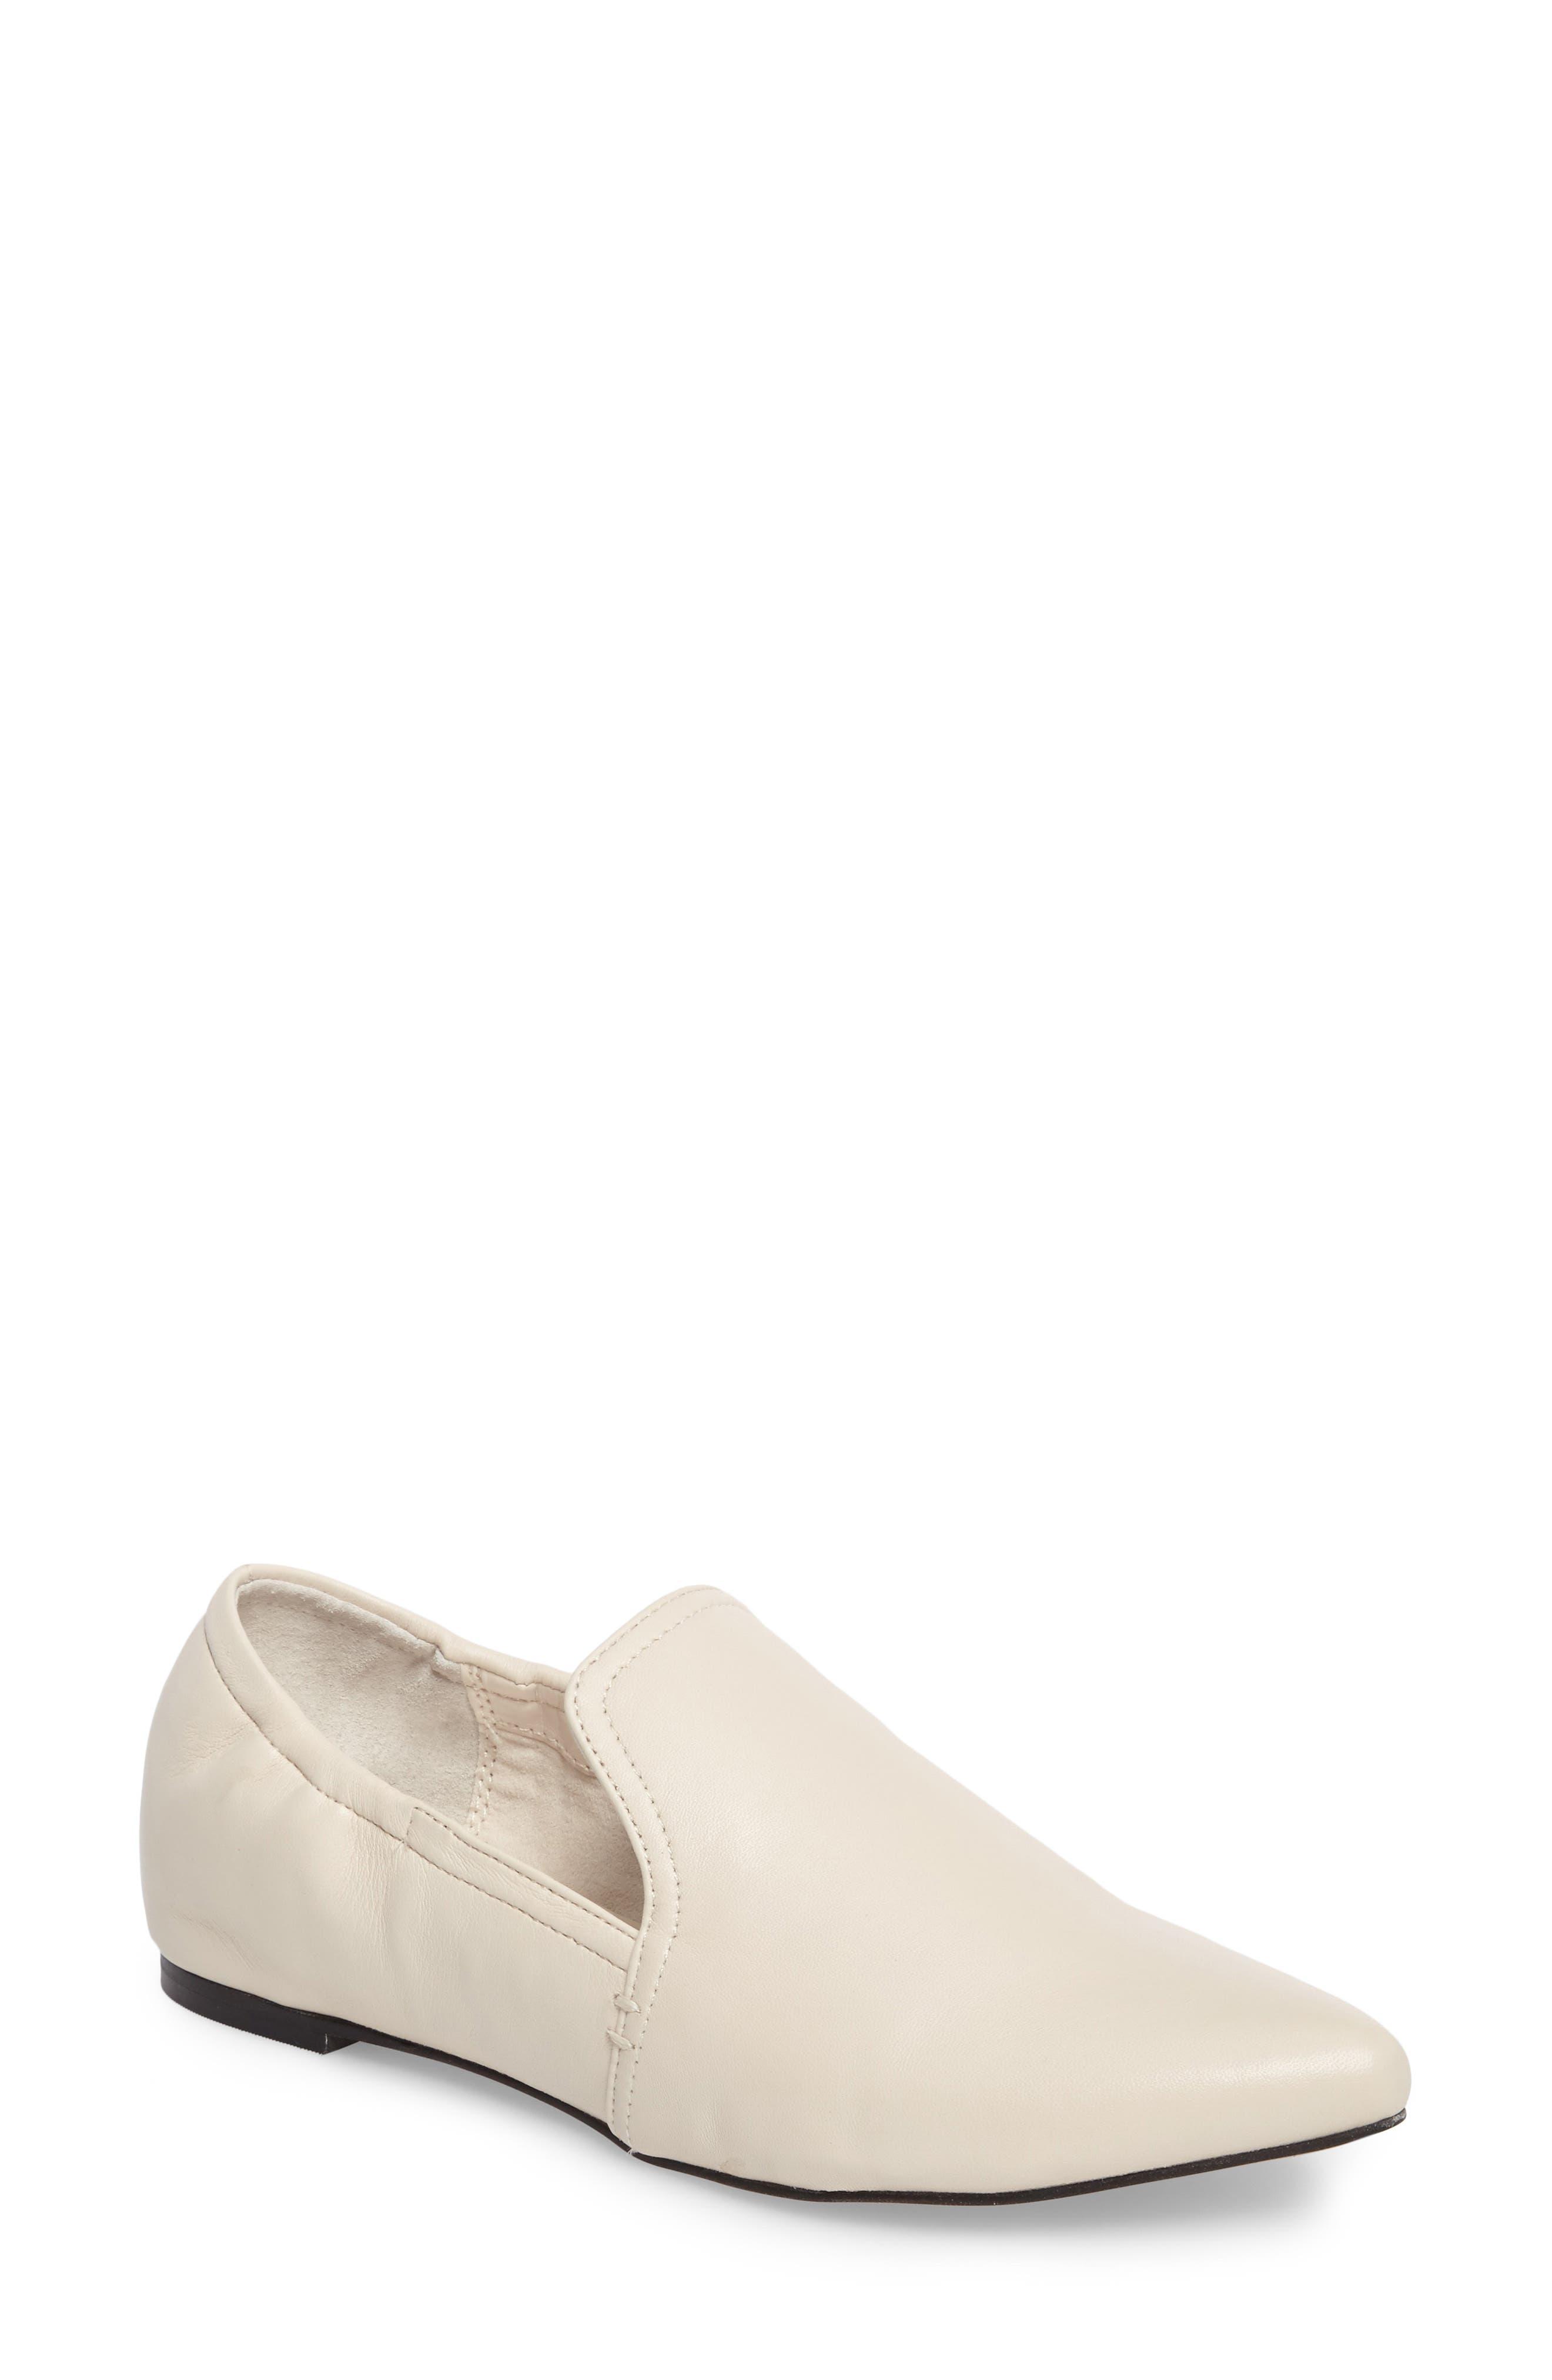 Hamond Loafer,                         Main,                         color, Ivory Leather